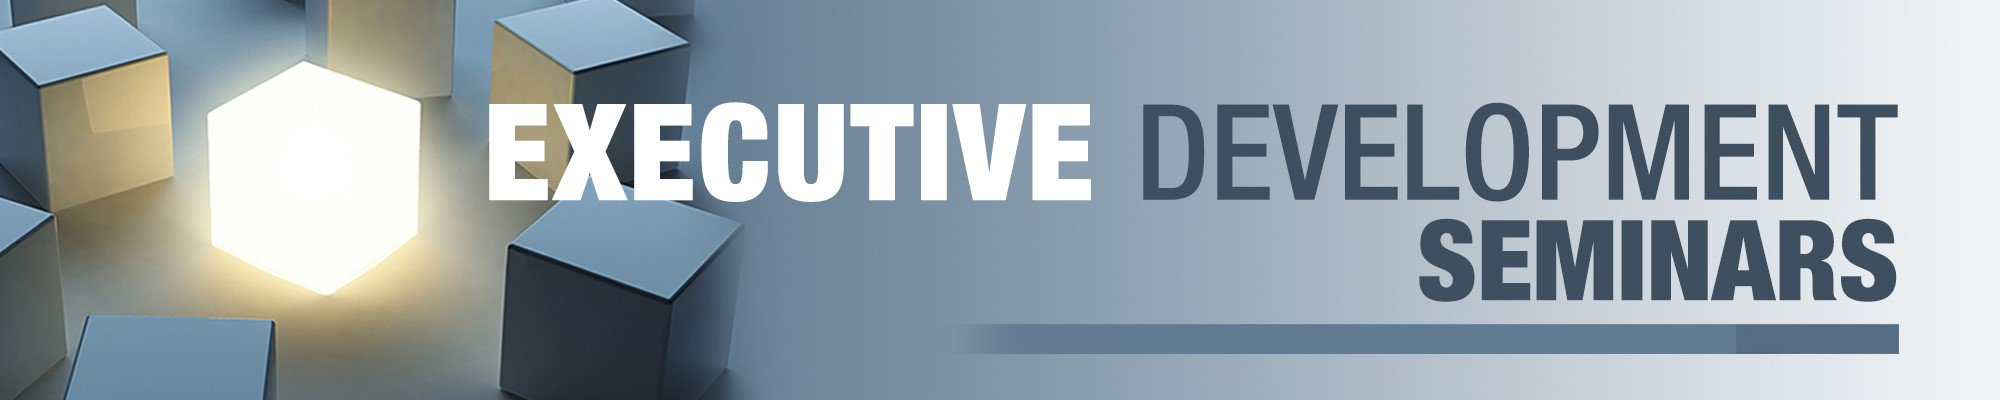 Executive Development Seminar: Ethical Leadership for Healthy Organizational Culture